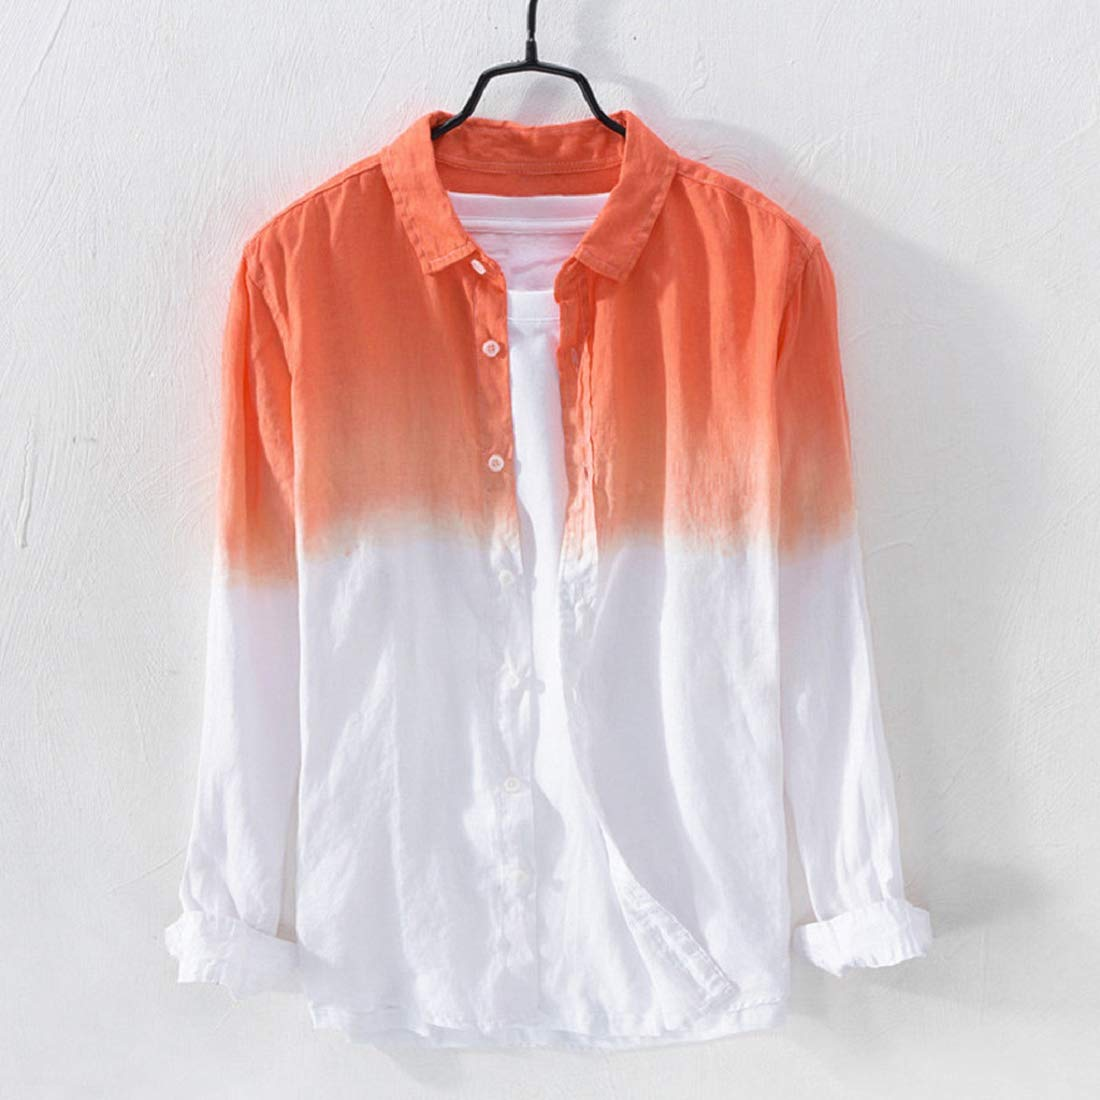 KASIDN Mens Shirts Mens Long Sleeve Shirt Breathable Lapel Collar Hanging Dyed Gradient Cotton Shirt Top Blouse